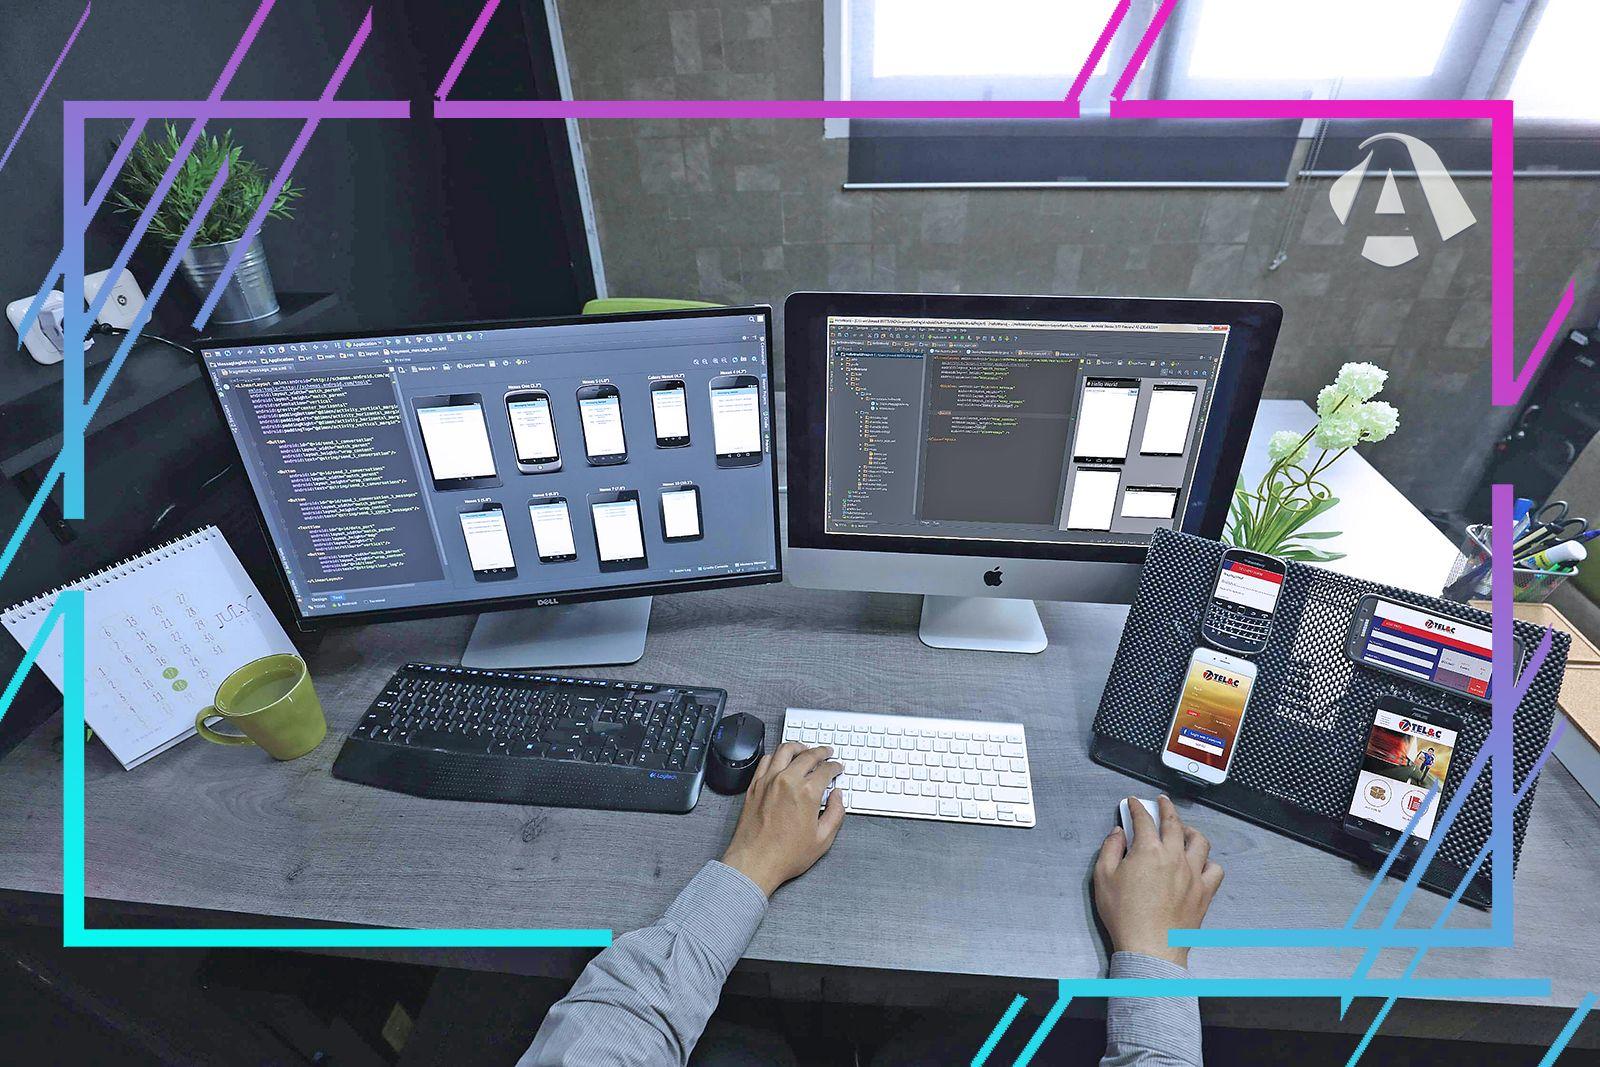 Arfadia---Mobile-Application-Developer-abstract-compressor.jpg